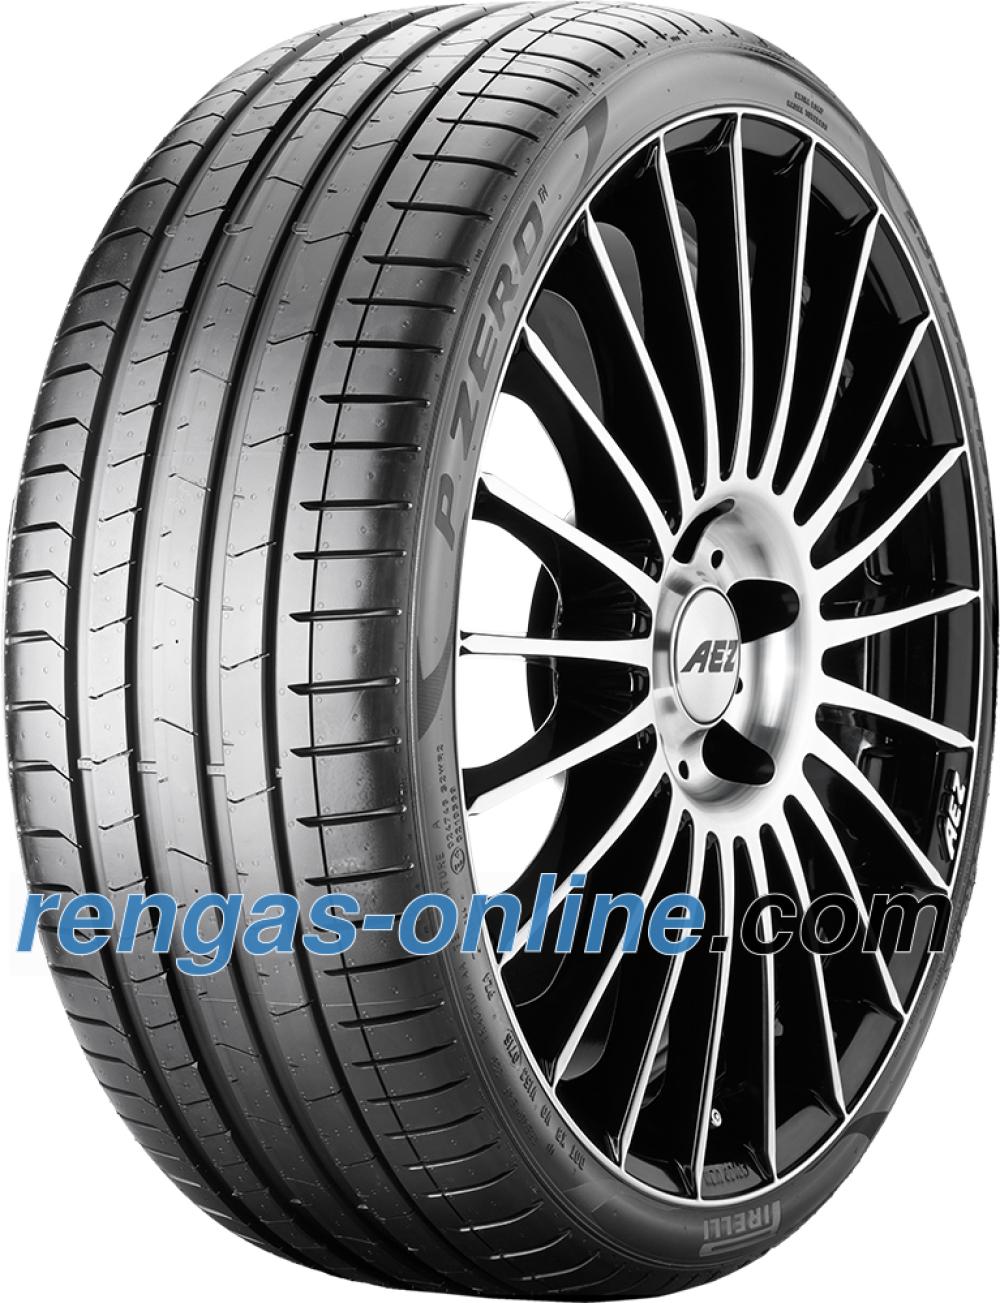 pirelli-p-zero-ls-25535-r20-97w-xl-pncs-vol